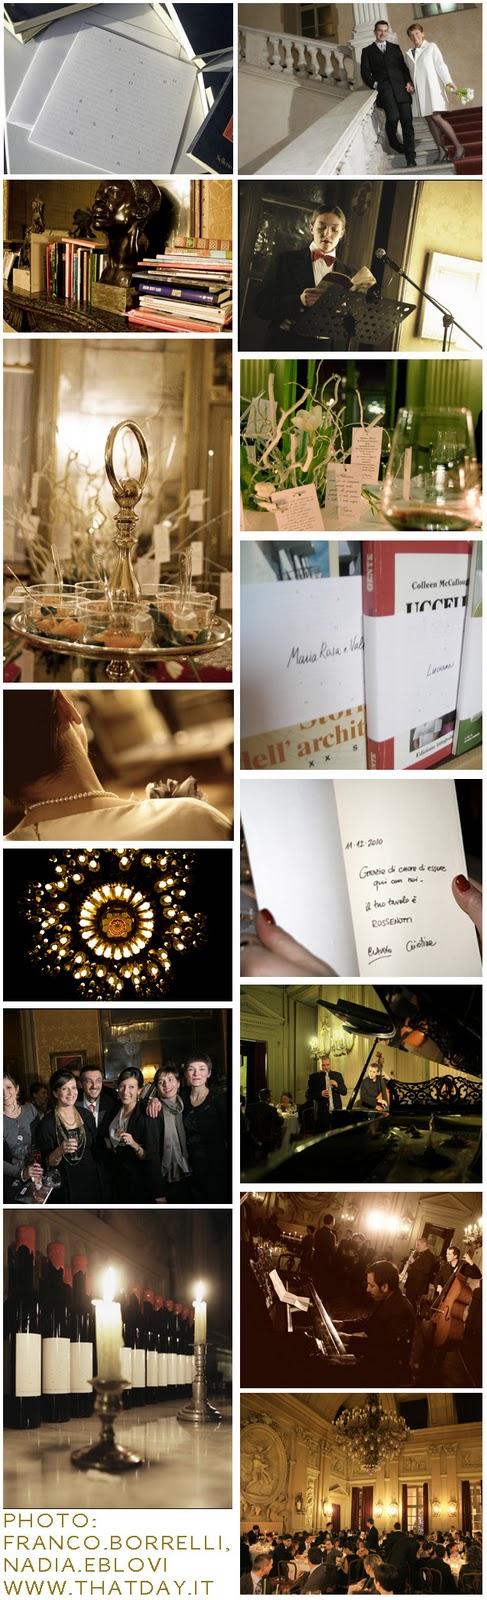 Suggestioni d'autore